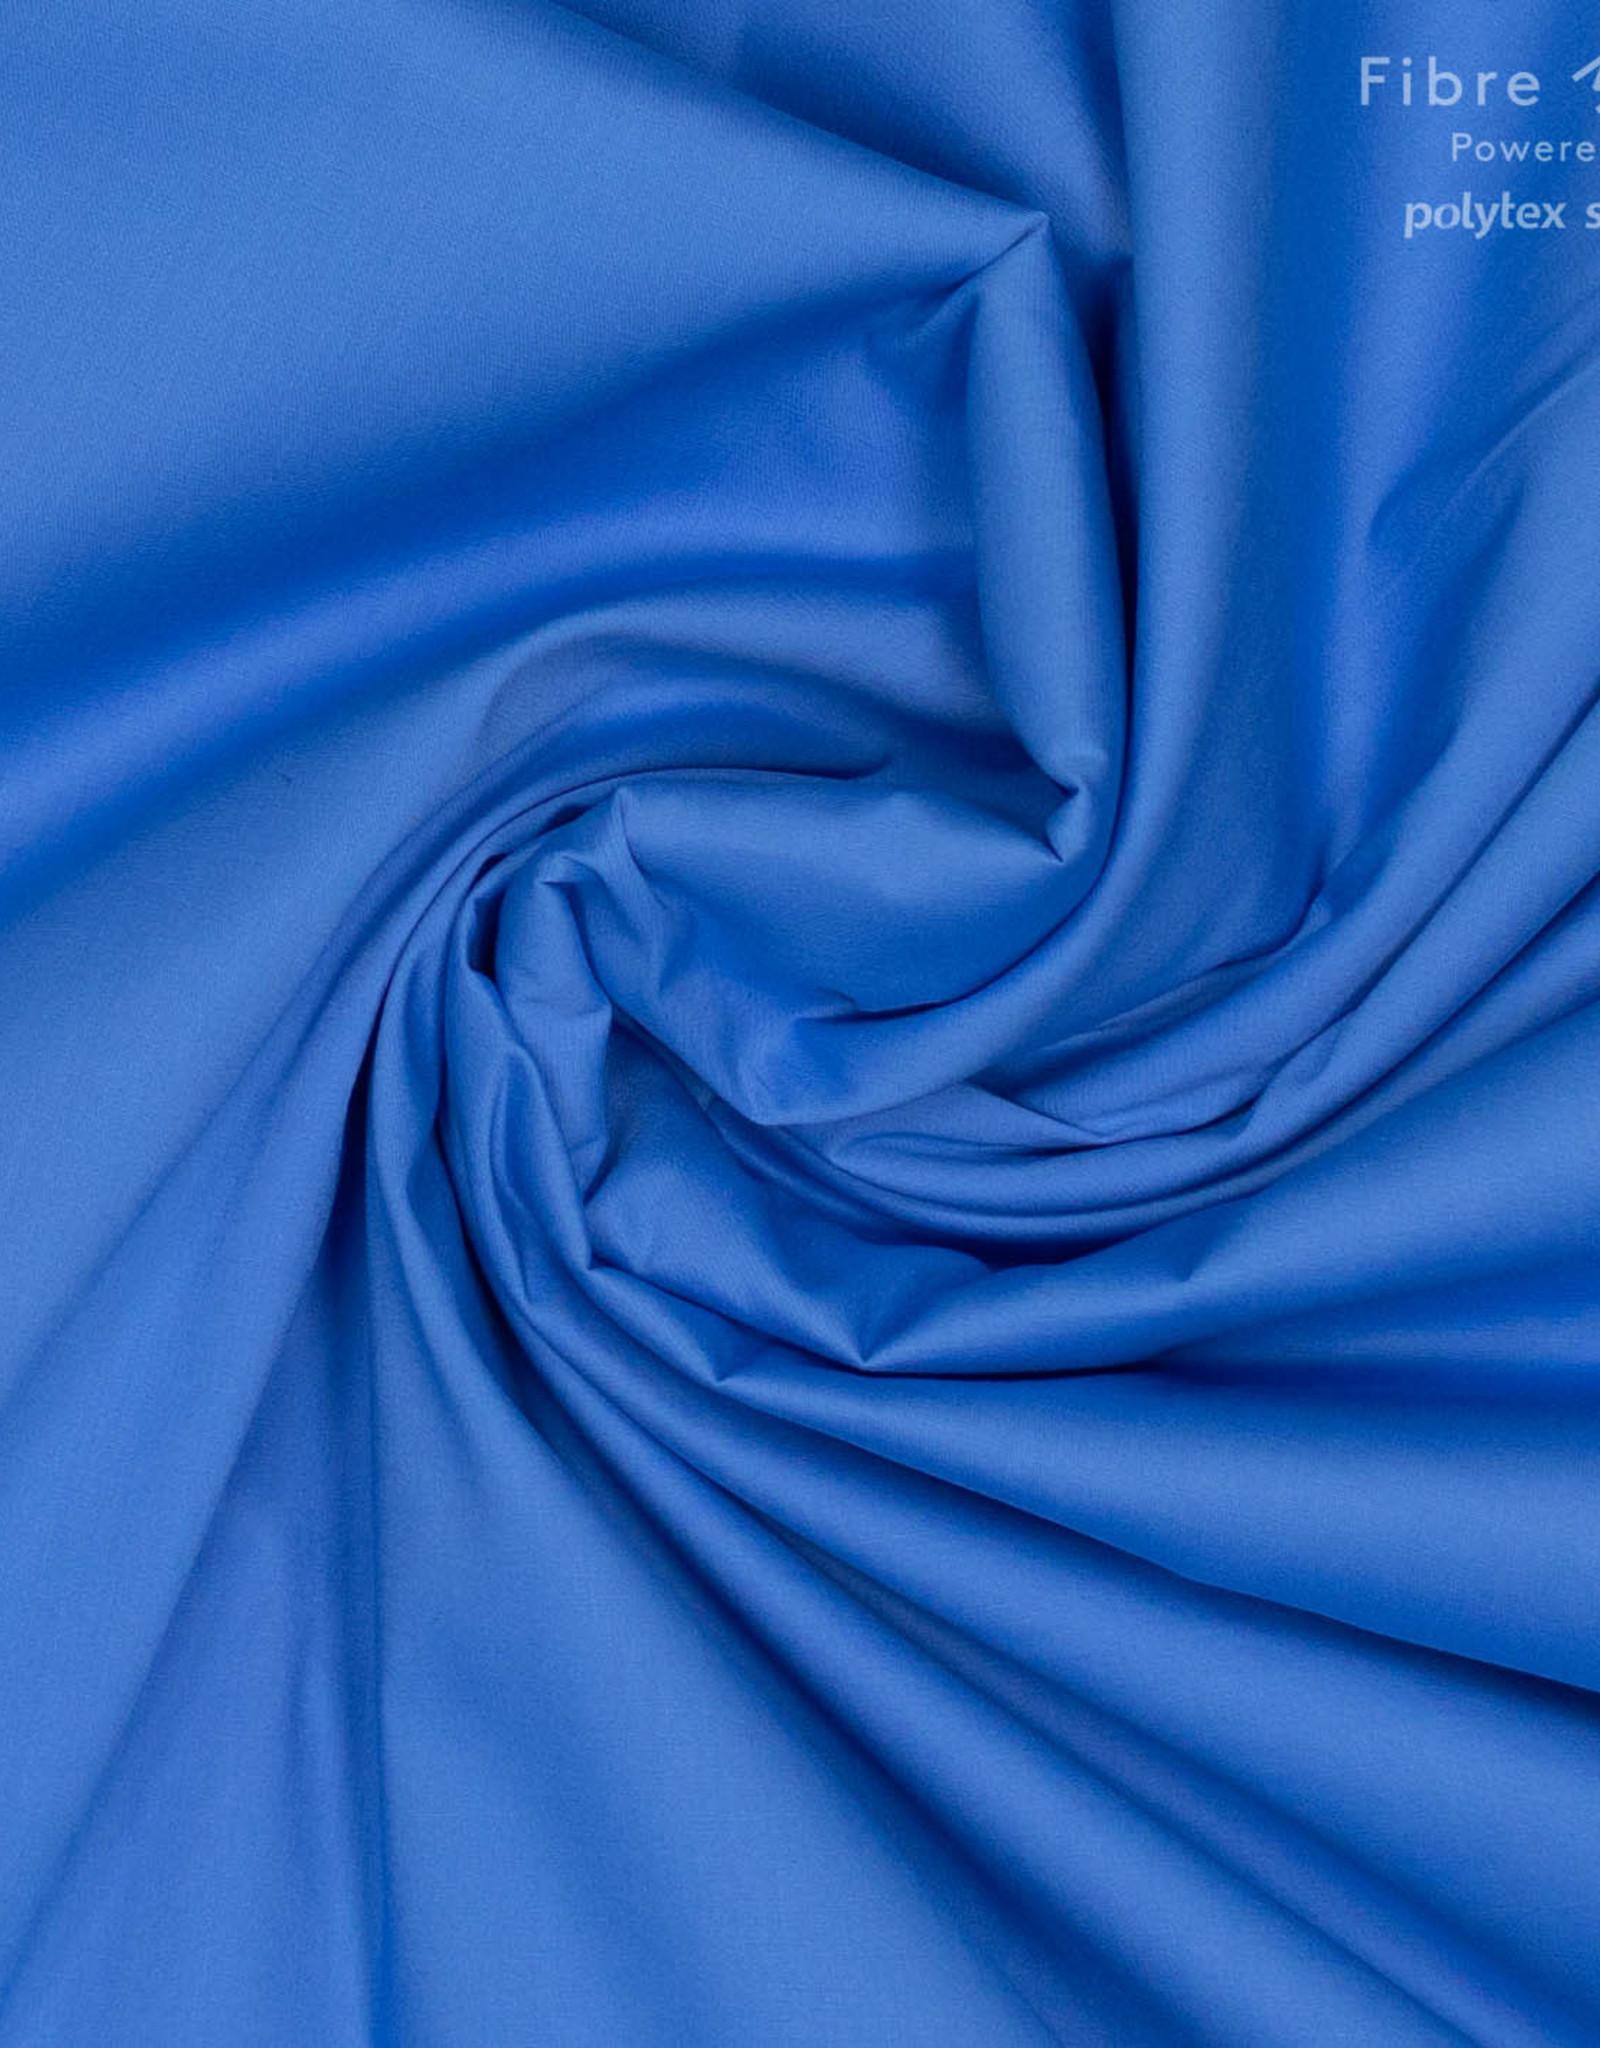 Fibre Mood Fibre Mood editie 15 Stretch Katoen Midnight Blauw (Chloe)